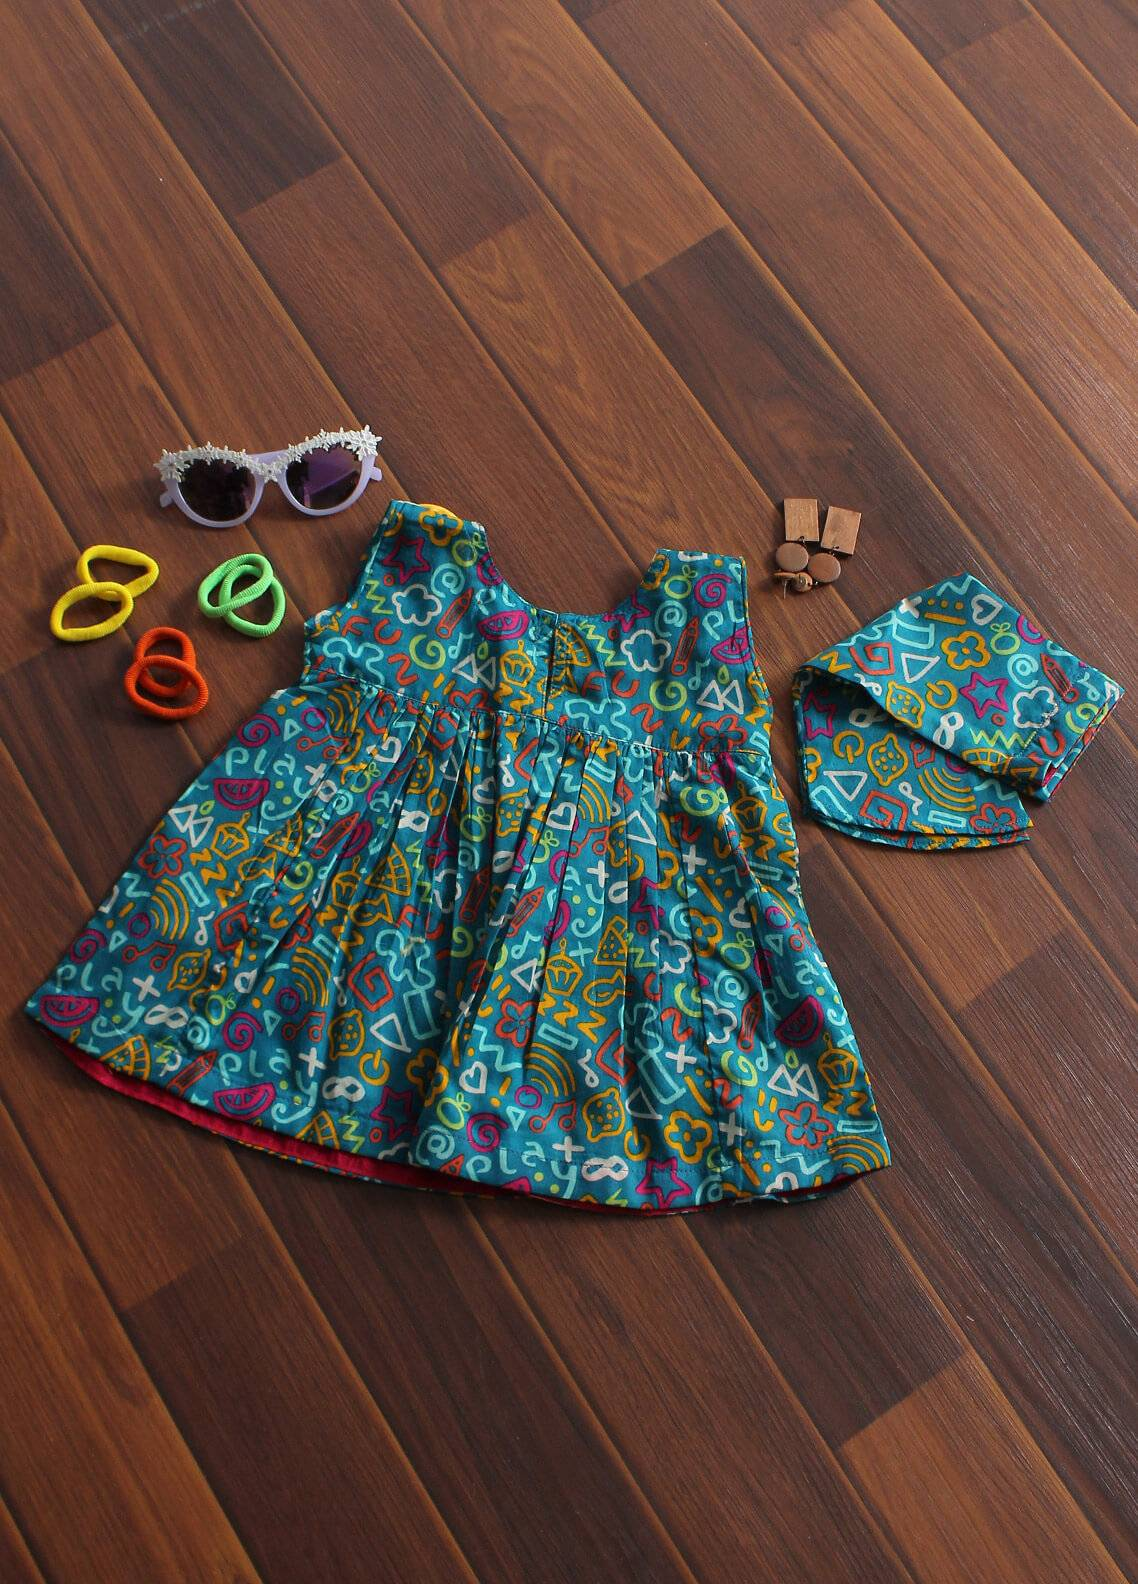 Senorita Cotton Fancy Kurtis for Girls - KAA-01190-SGN